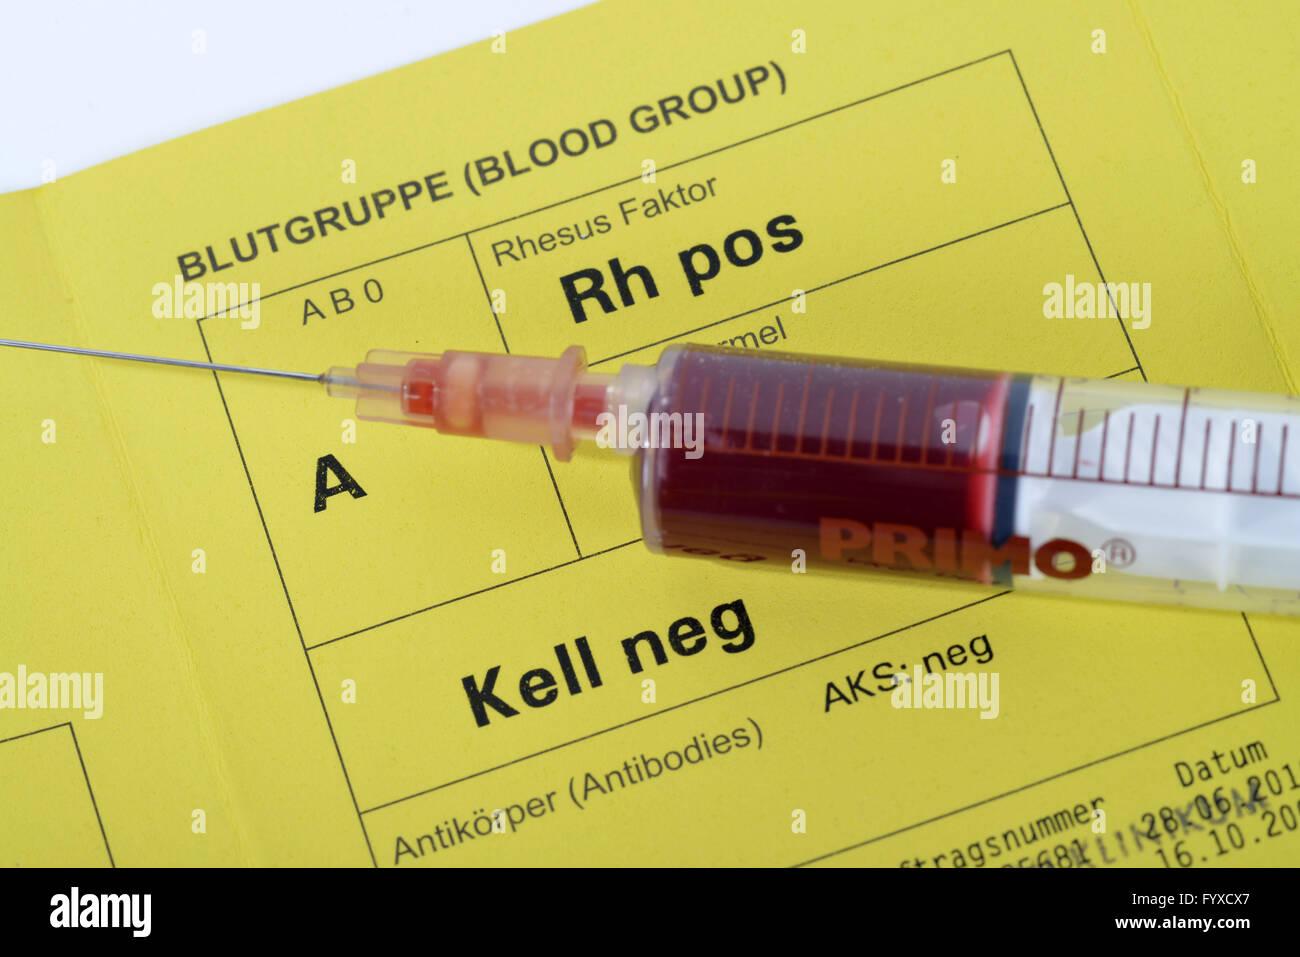 Blutgruppe 0 rhesusfaktor pos dating